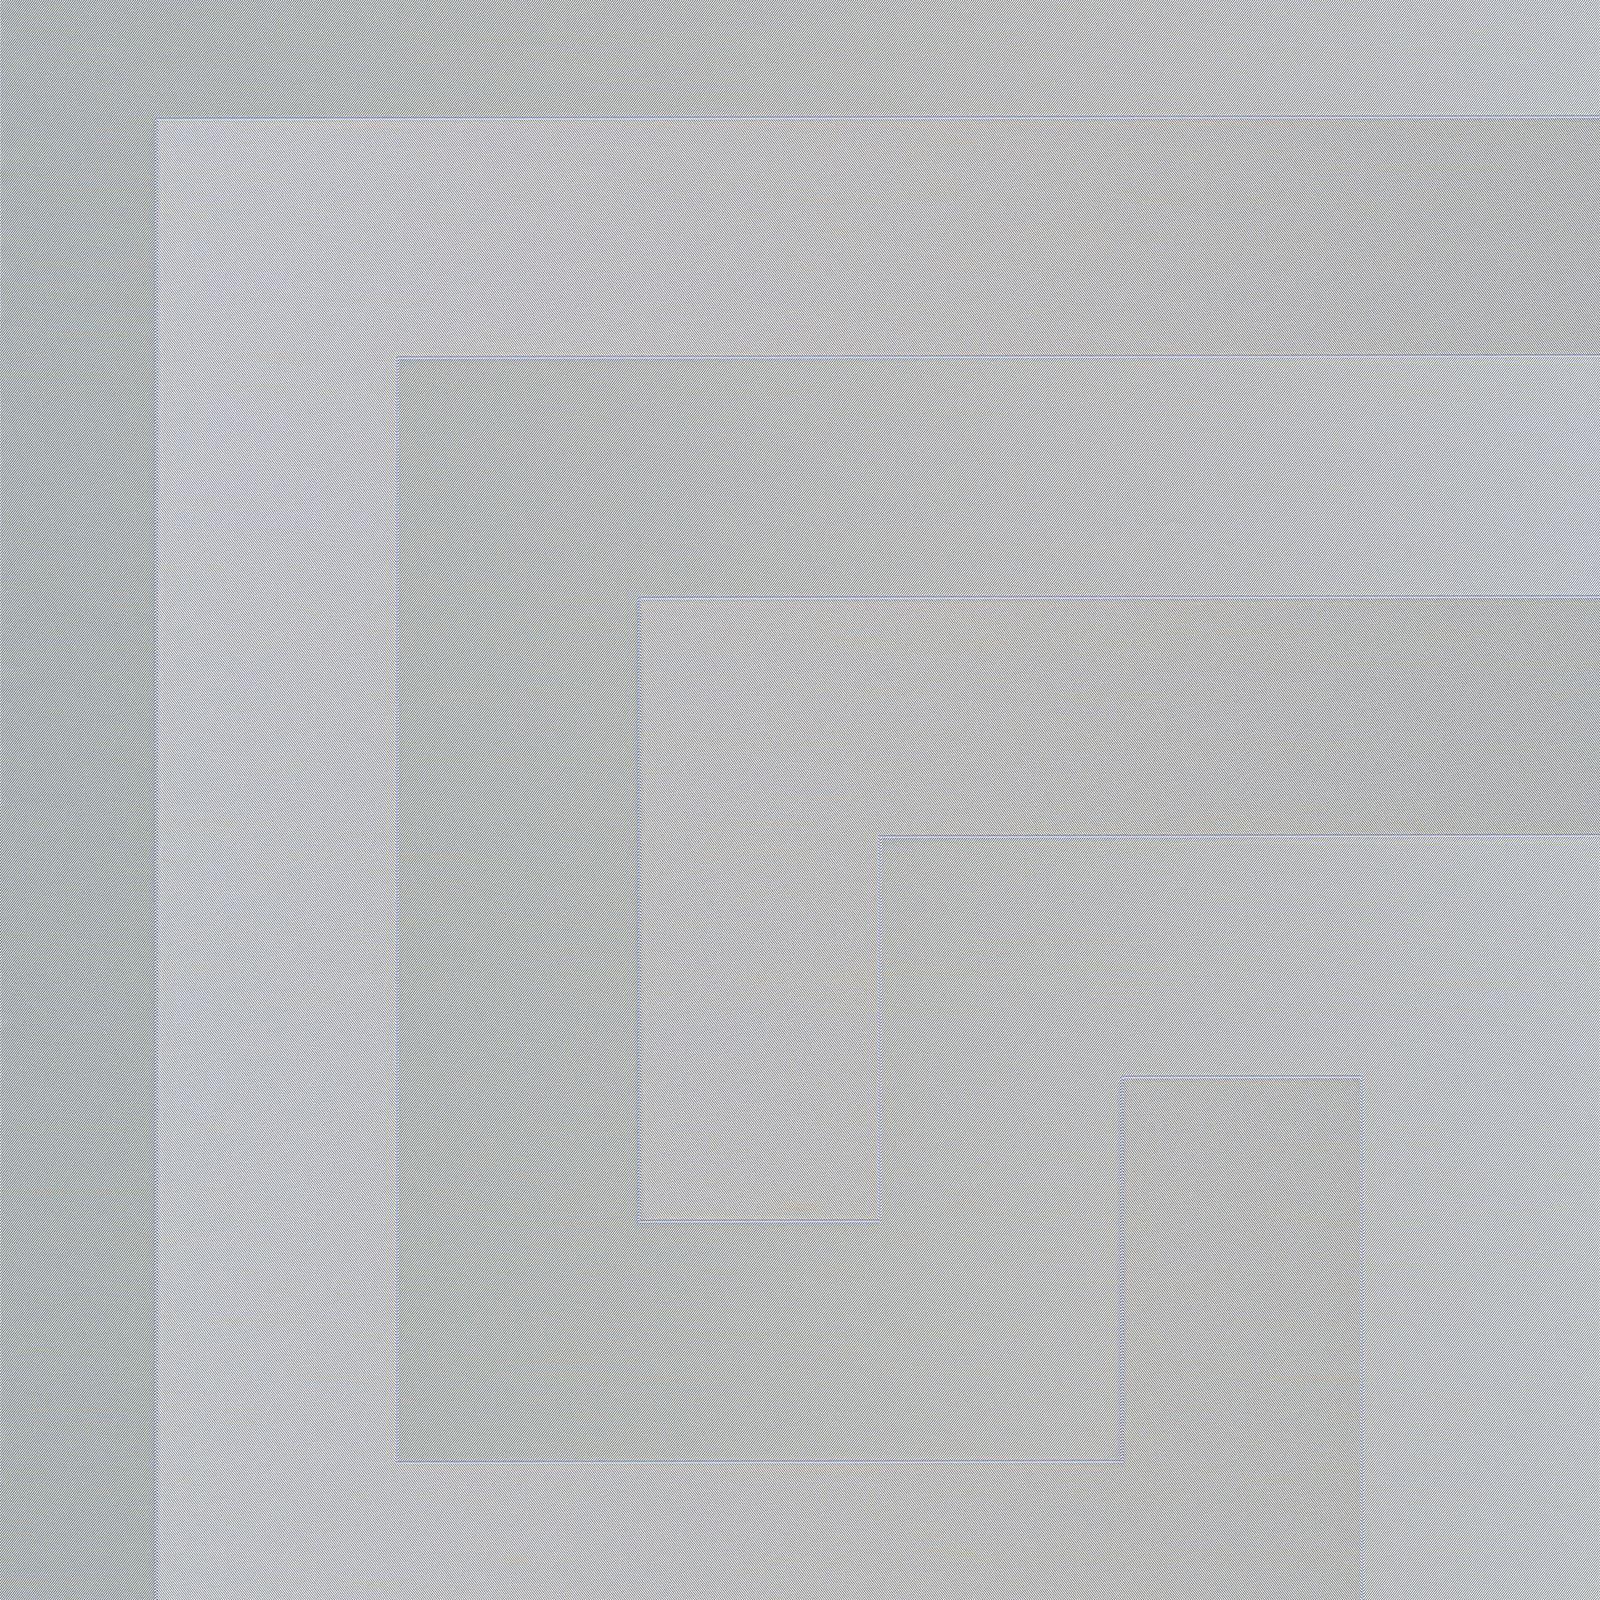 versace designer greek key wallpaper and border range gold silver  - versacedesignergreekkeywallpaperandborderrange